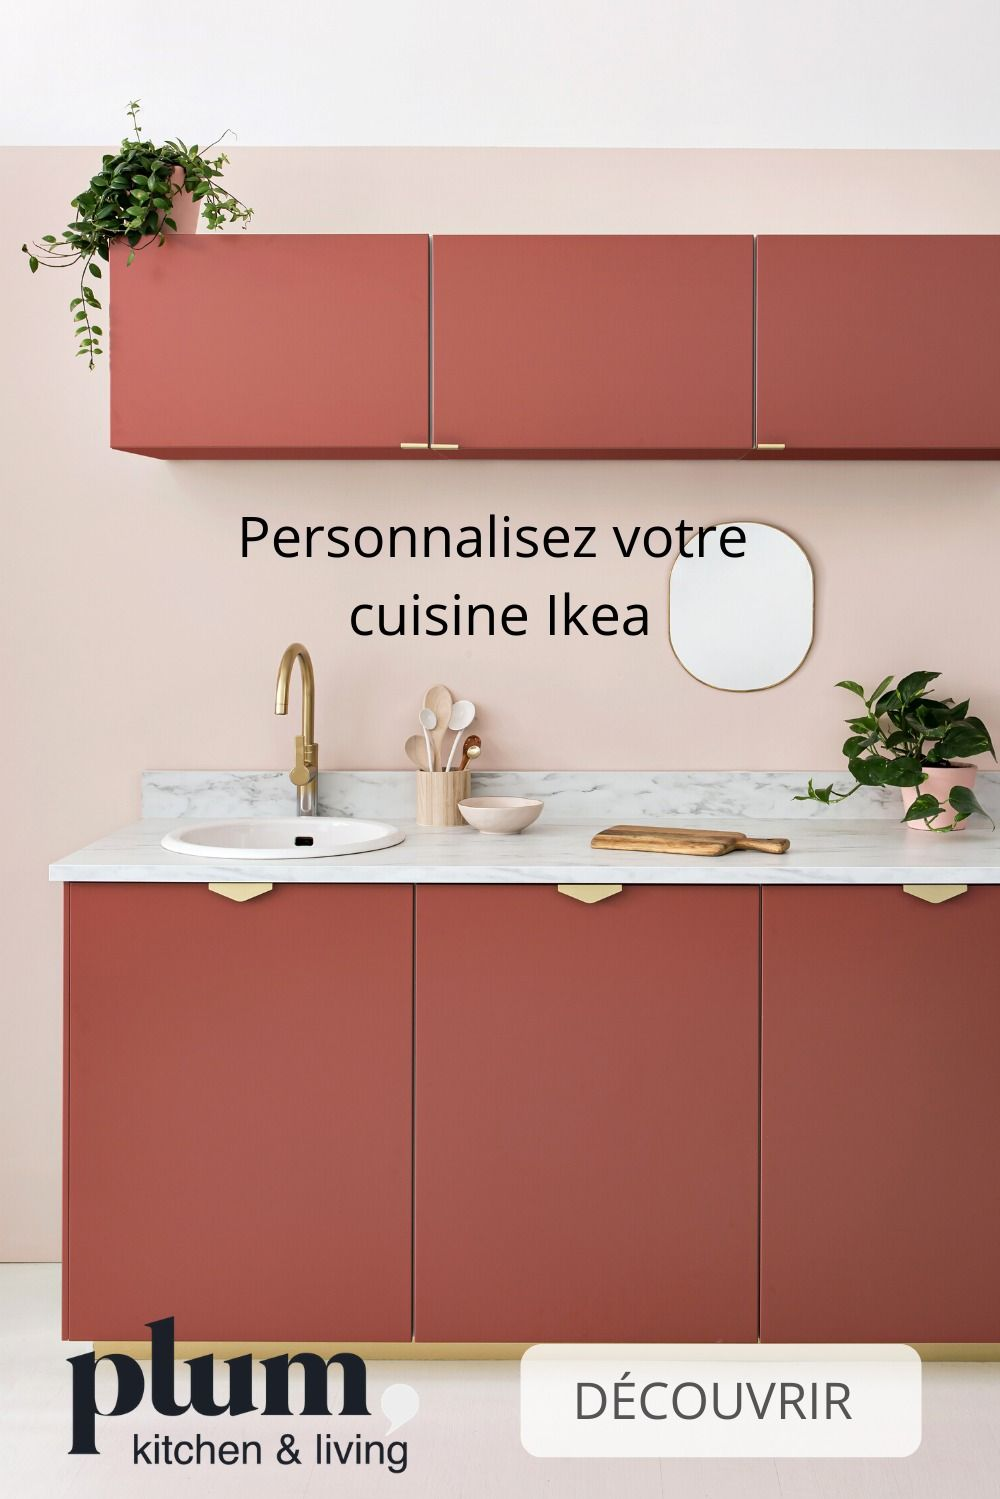 cuisine ikea facade sans poignee